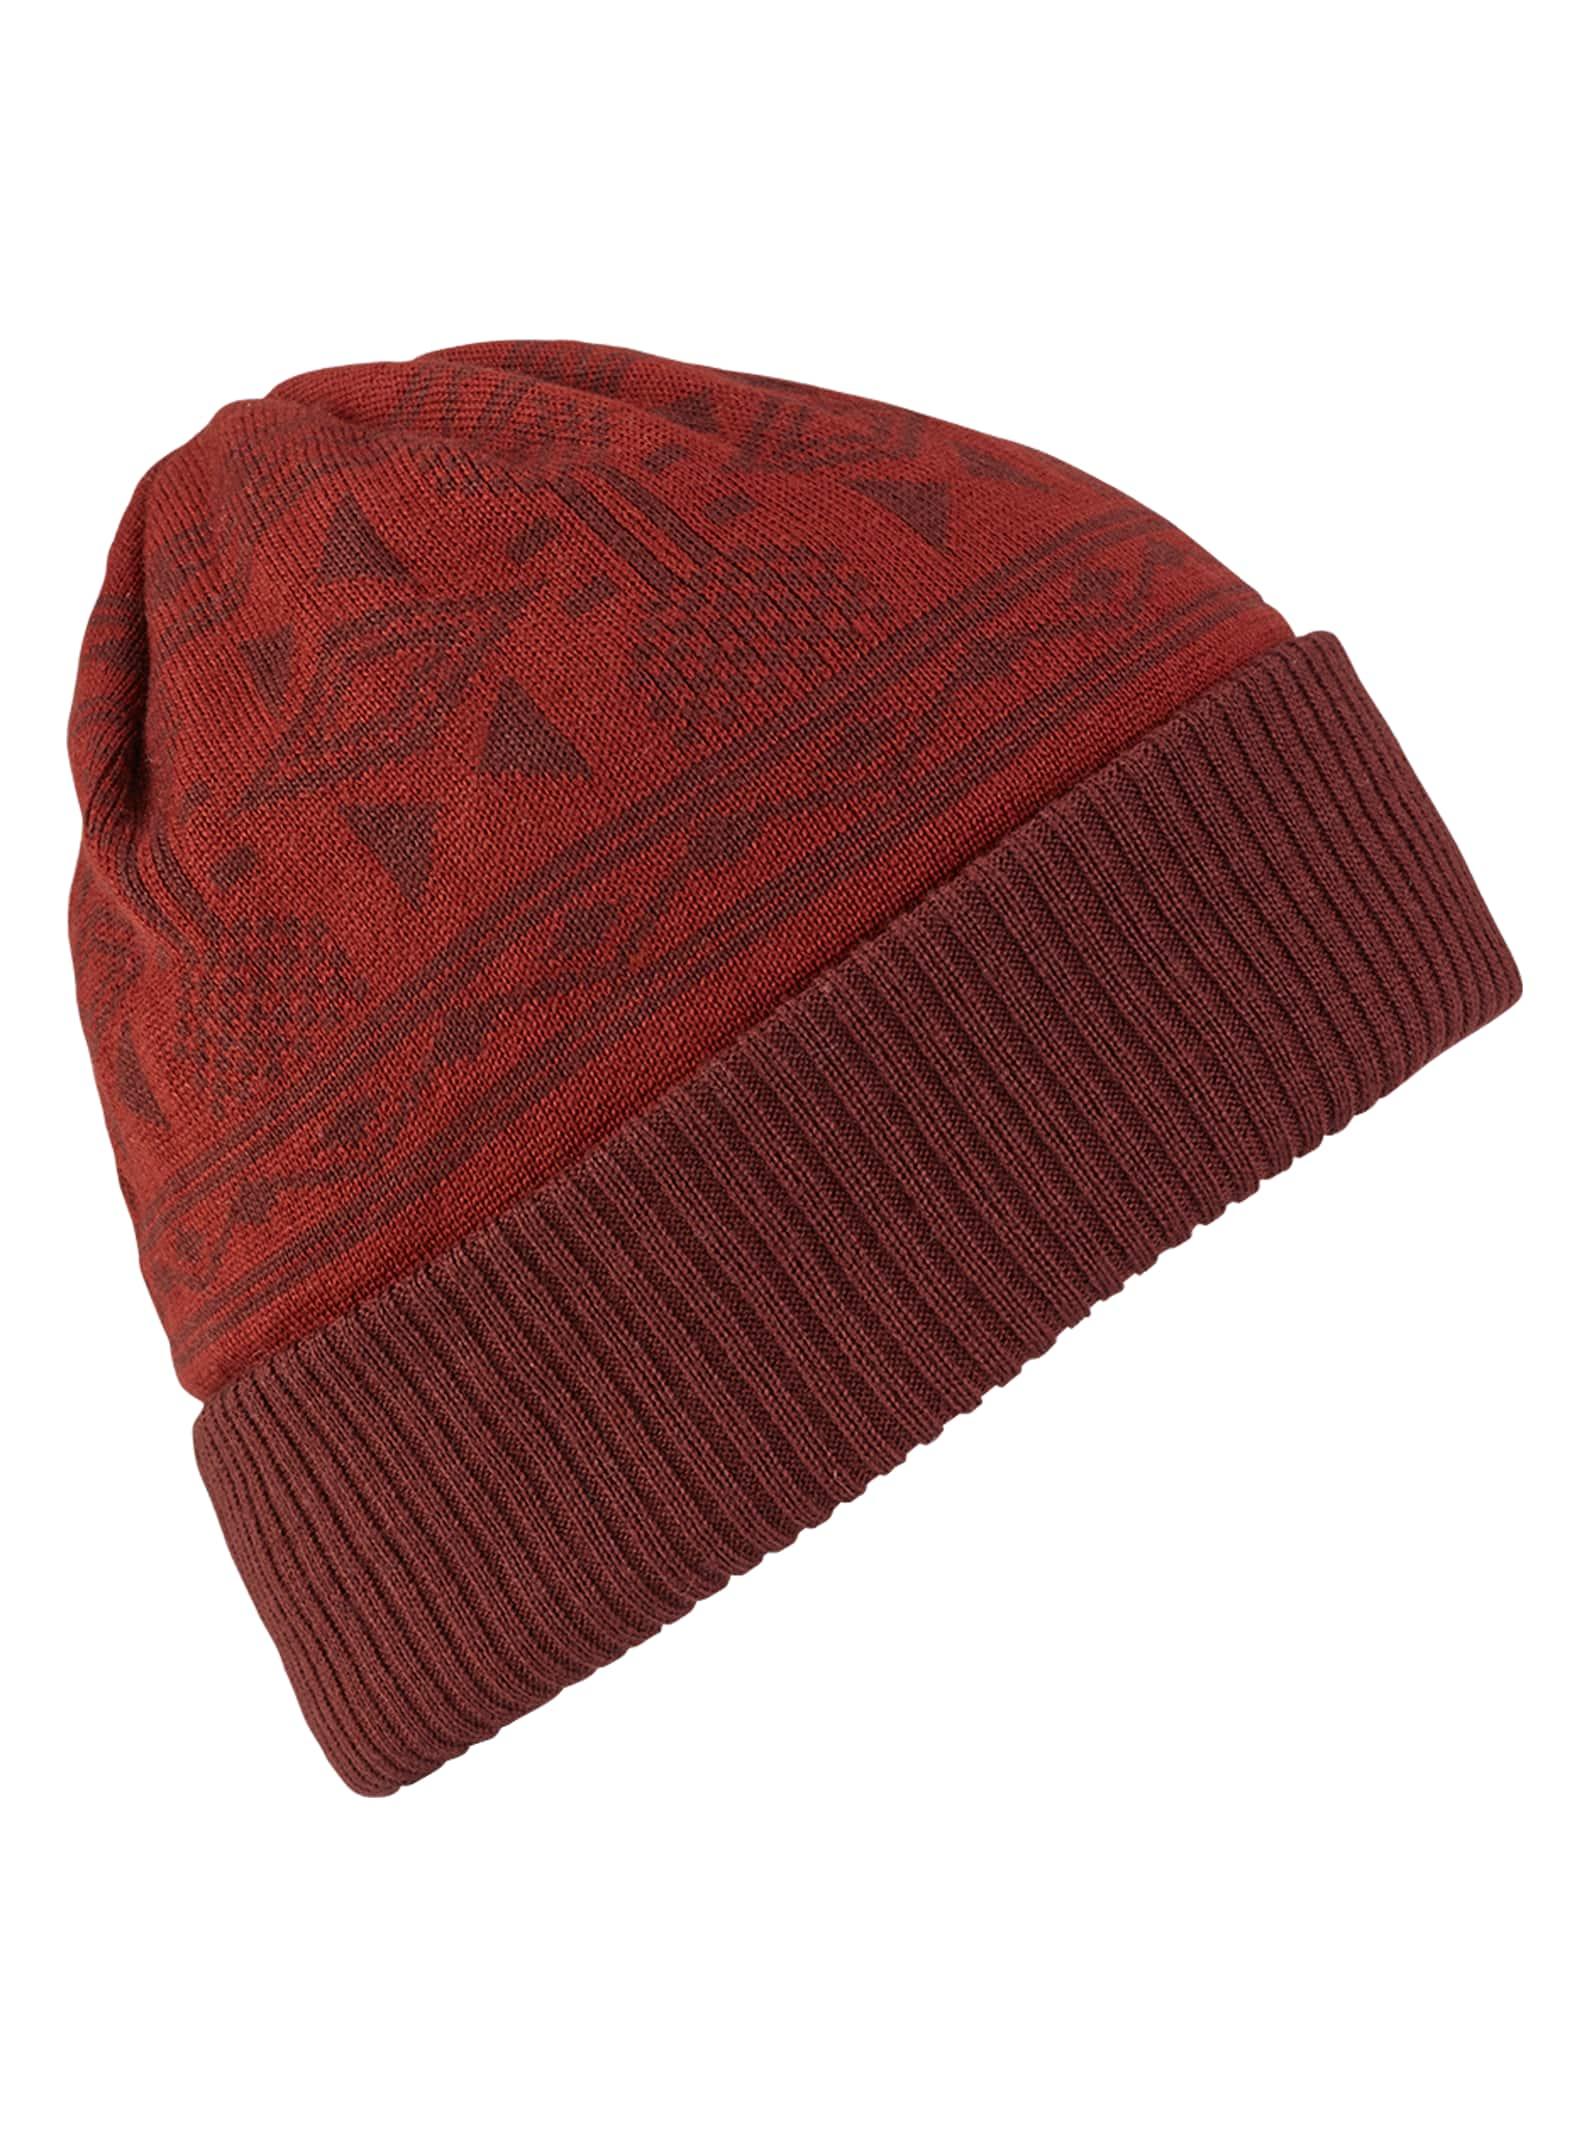 d76d5f9f900 Men s Hats   Beanies